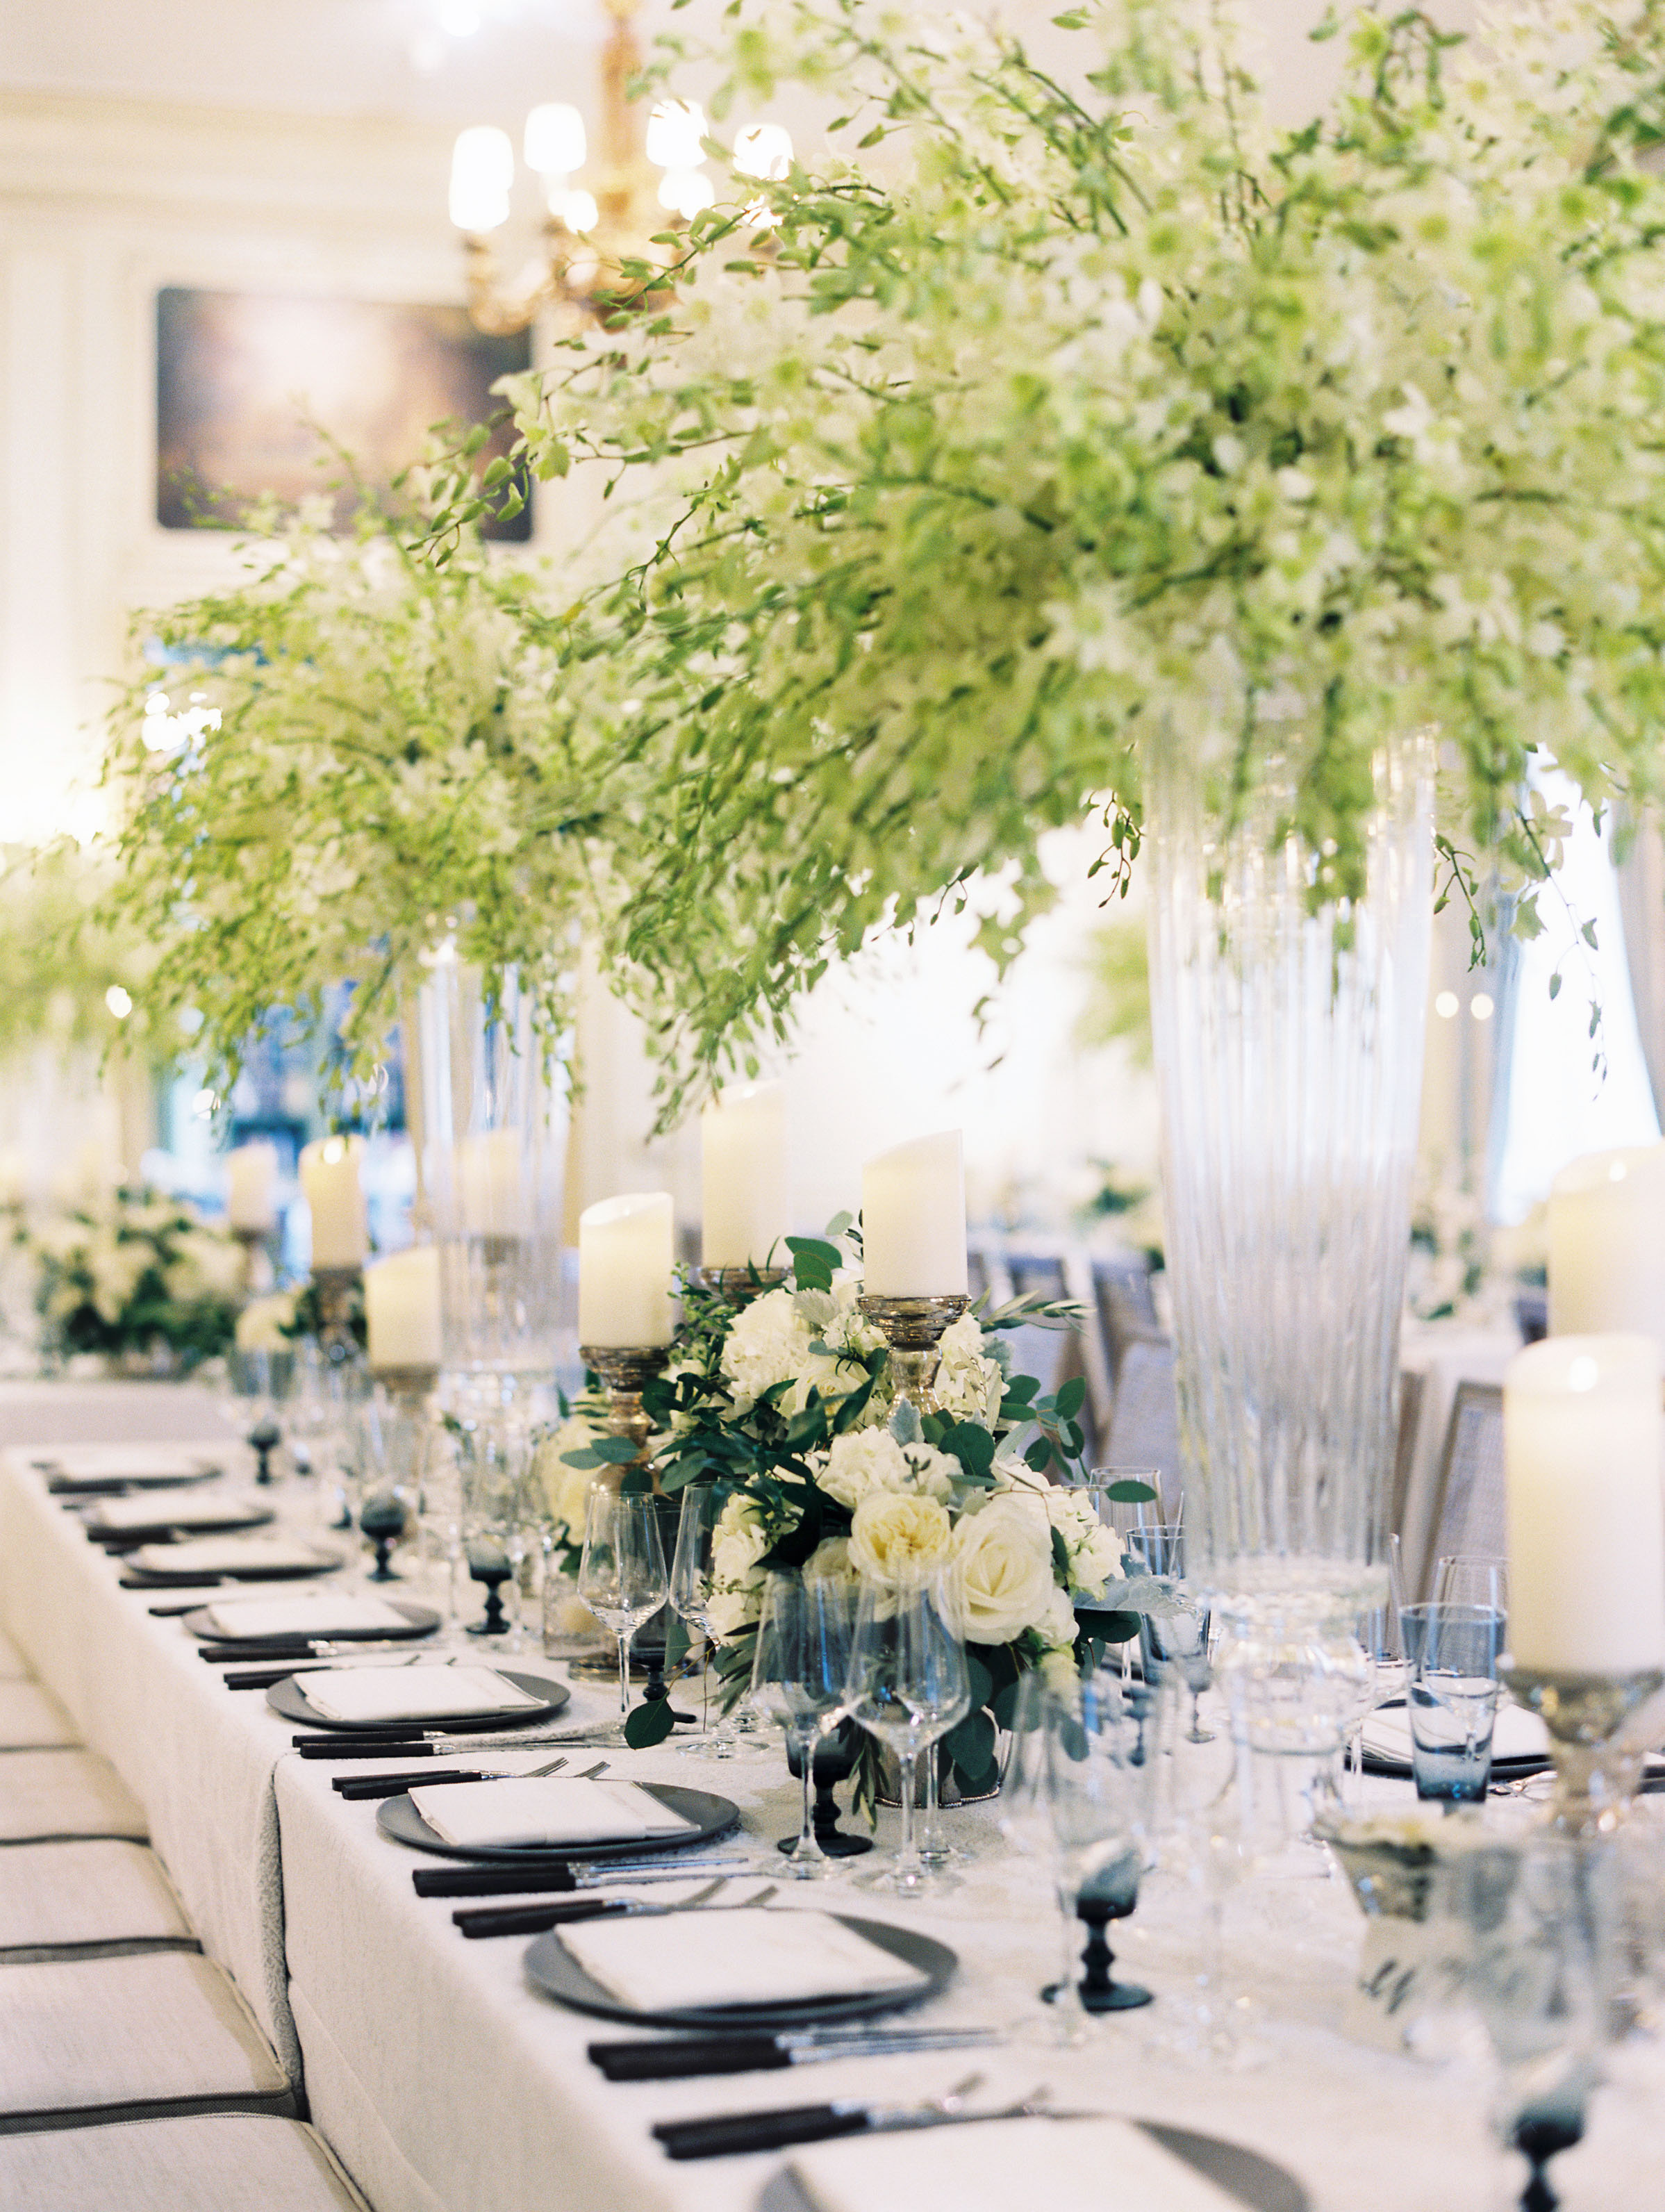 jermaine scott wedding dc table